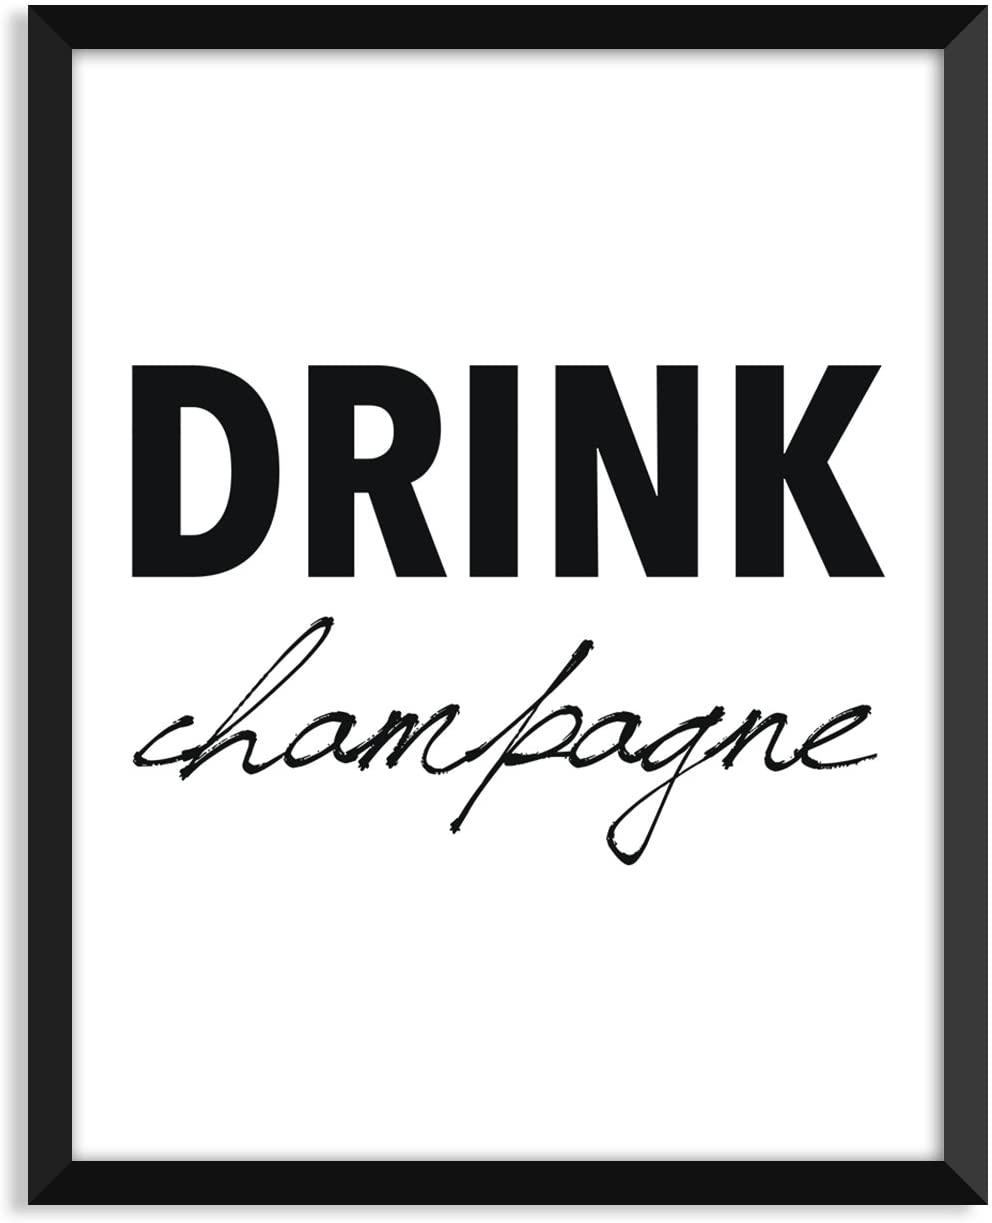 Serif Design Studios Drink Champagne, Bold-Cursive, Black and White, Scandinavian, Minimalist Poster, Home Decor, College Dorm Room Decorations, Wall Art